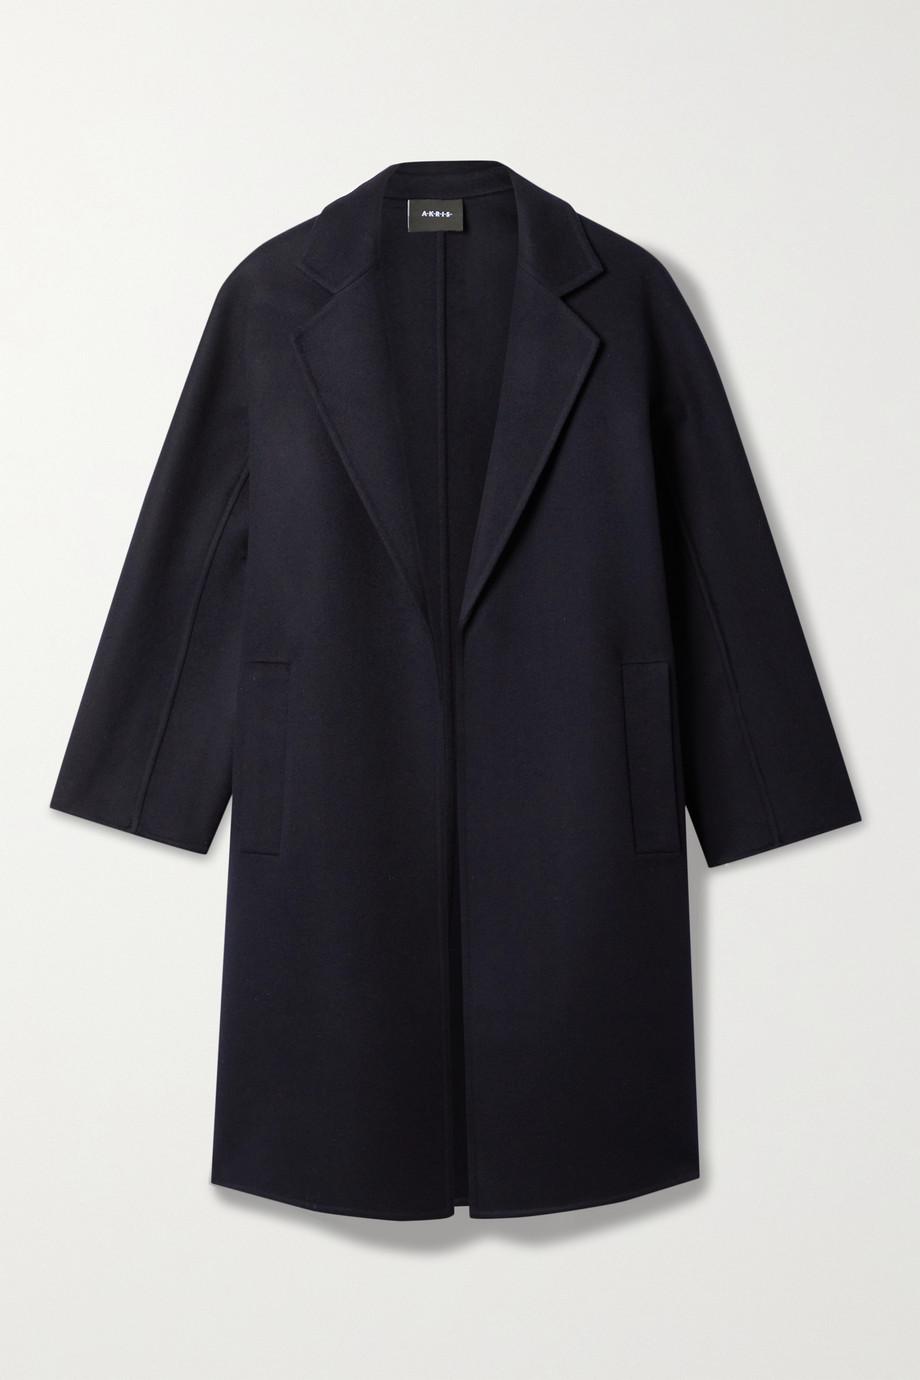 Akris Halma cashmere coat